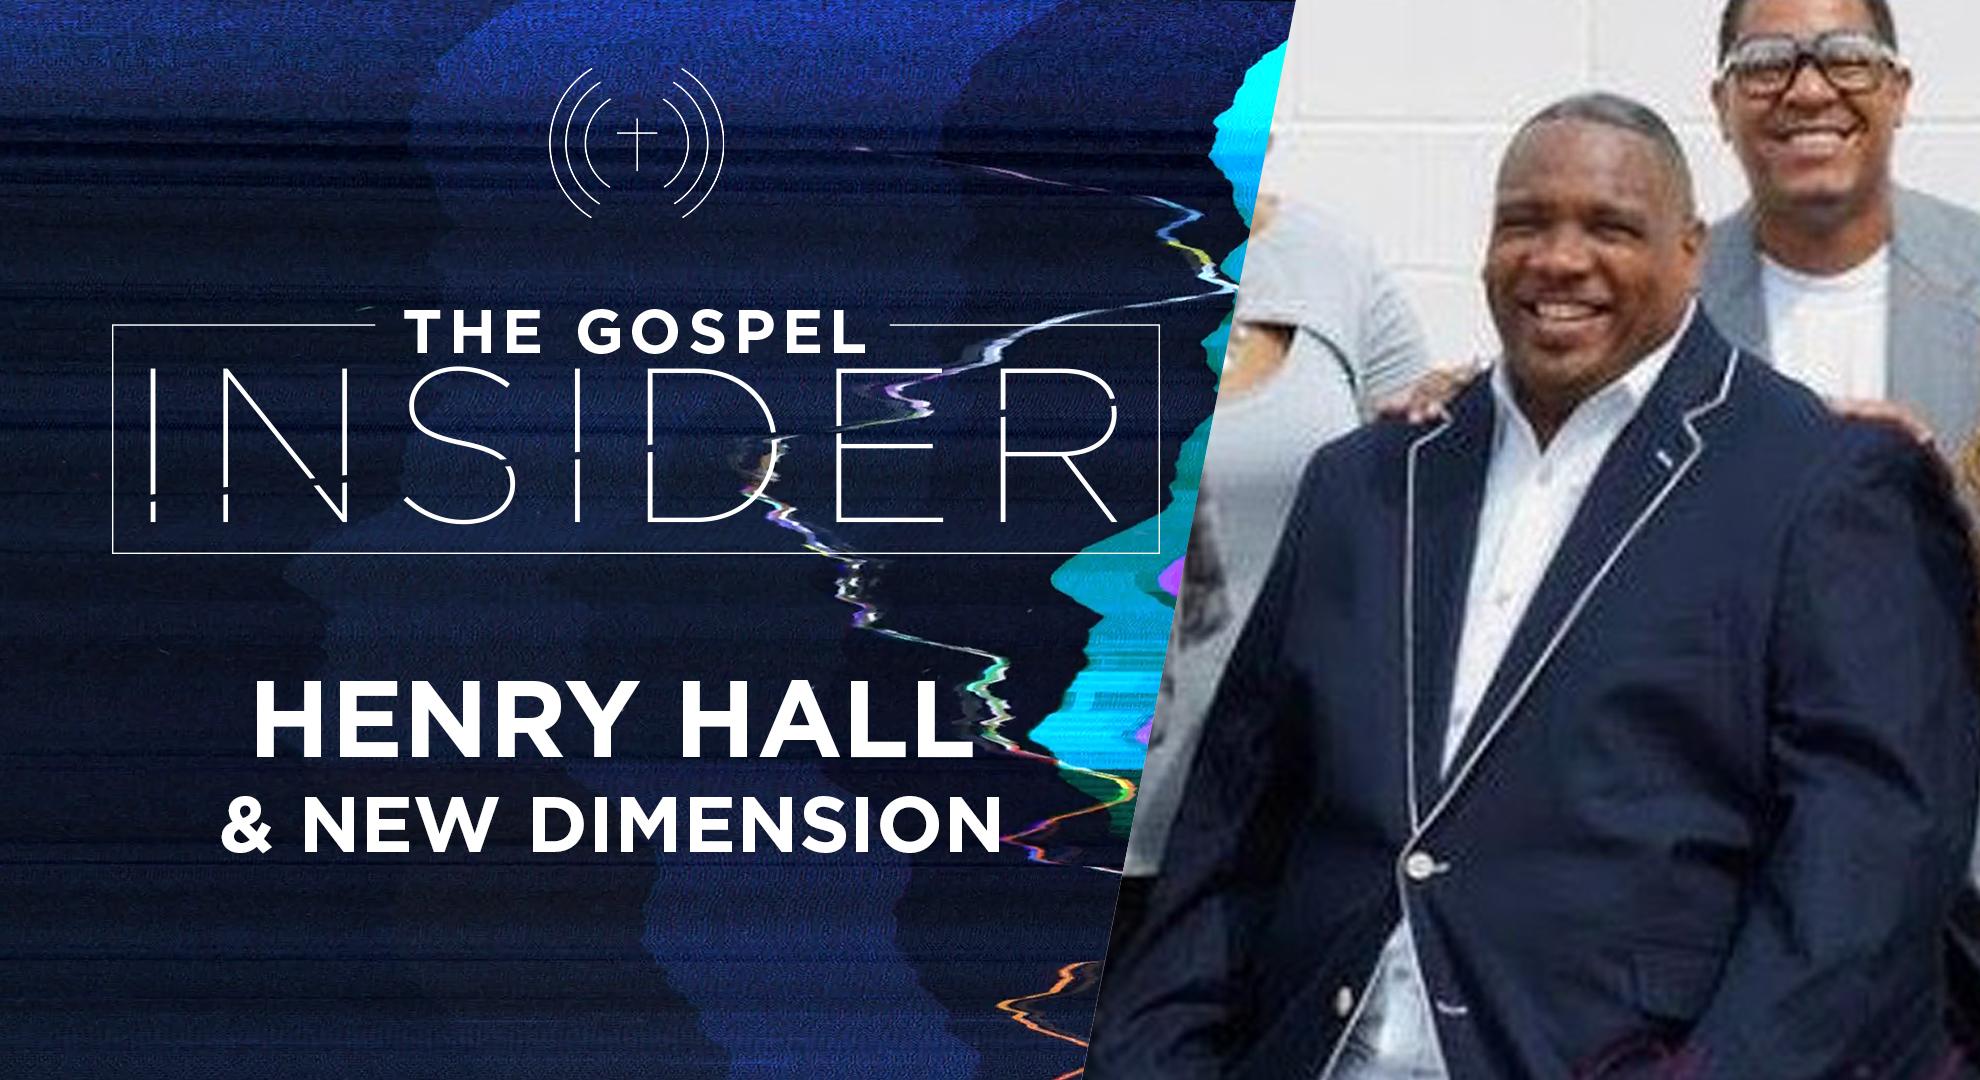 The Gospel Insider – Henry Hall & New Dimension